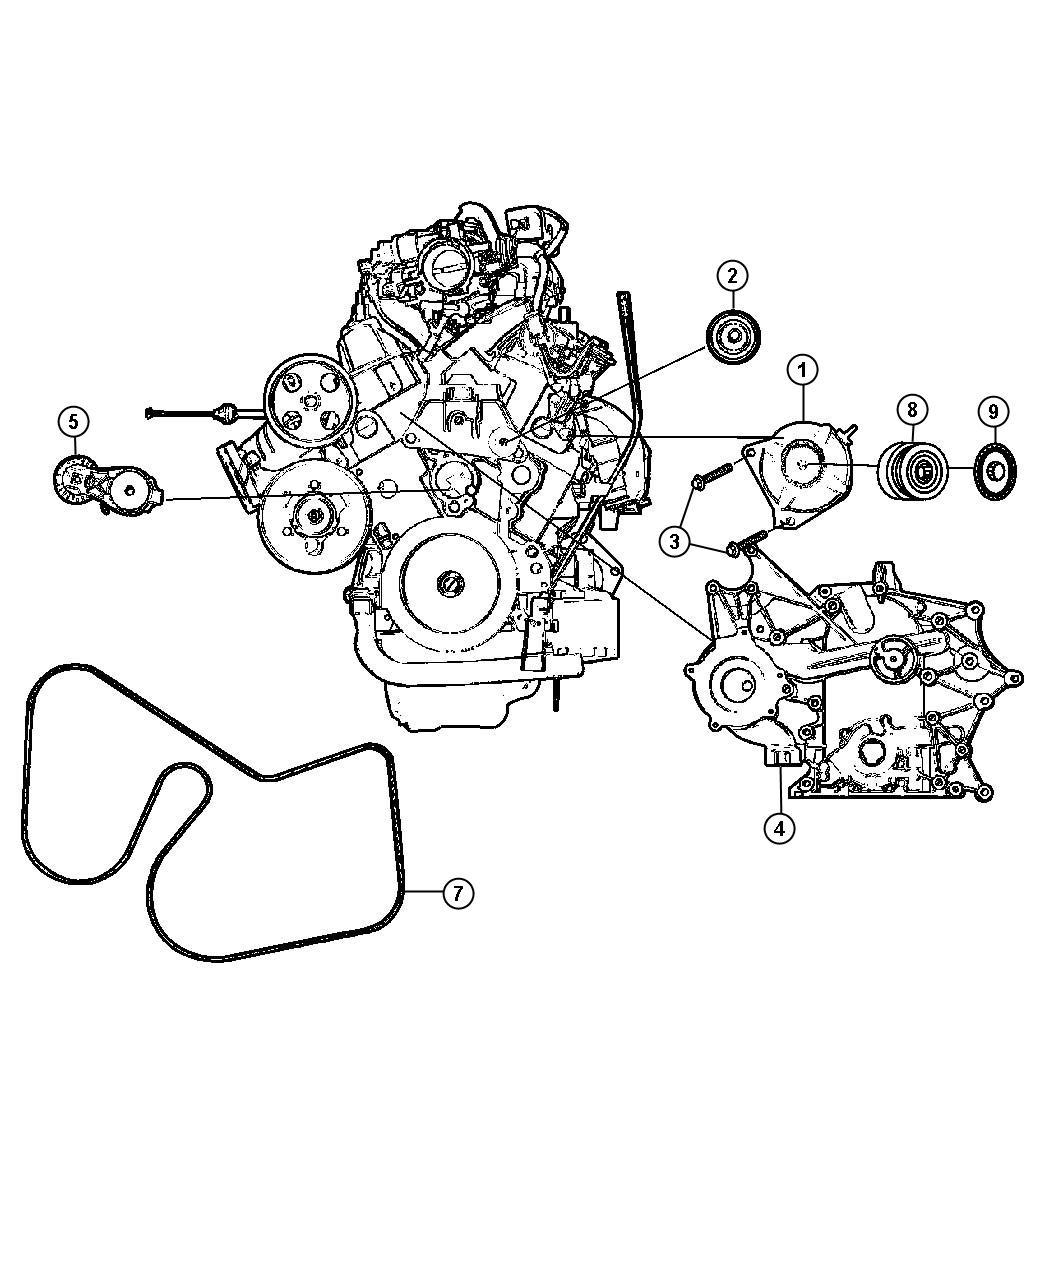 Mercedes m104 engine wiring diagram and engine diagram